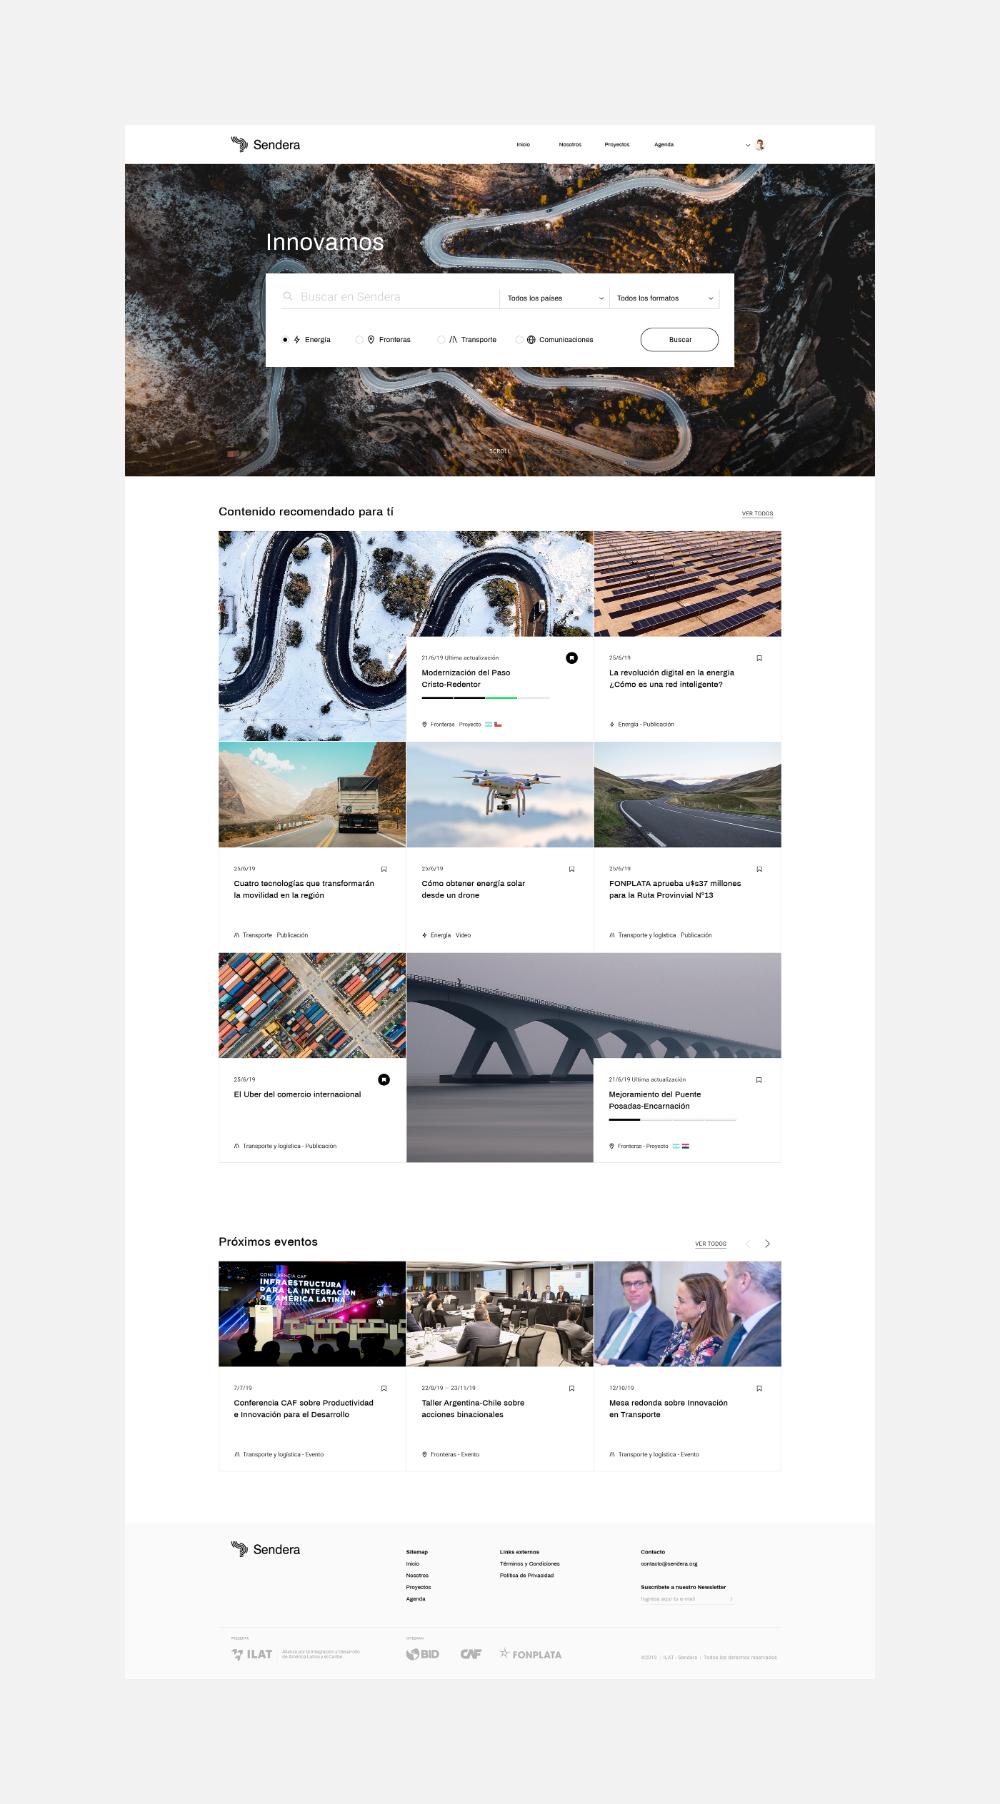 Sendera On Behance In 2020 Modern Web Design Digital Design Graphic Design Studios